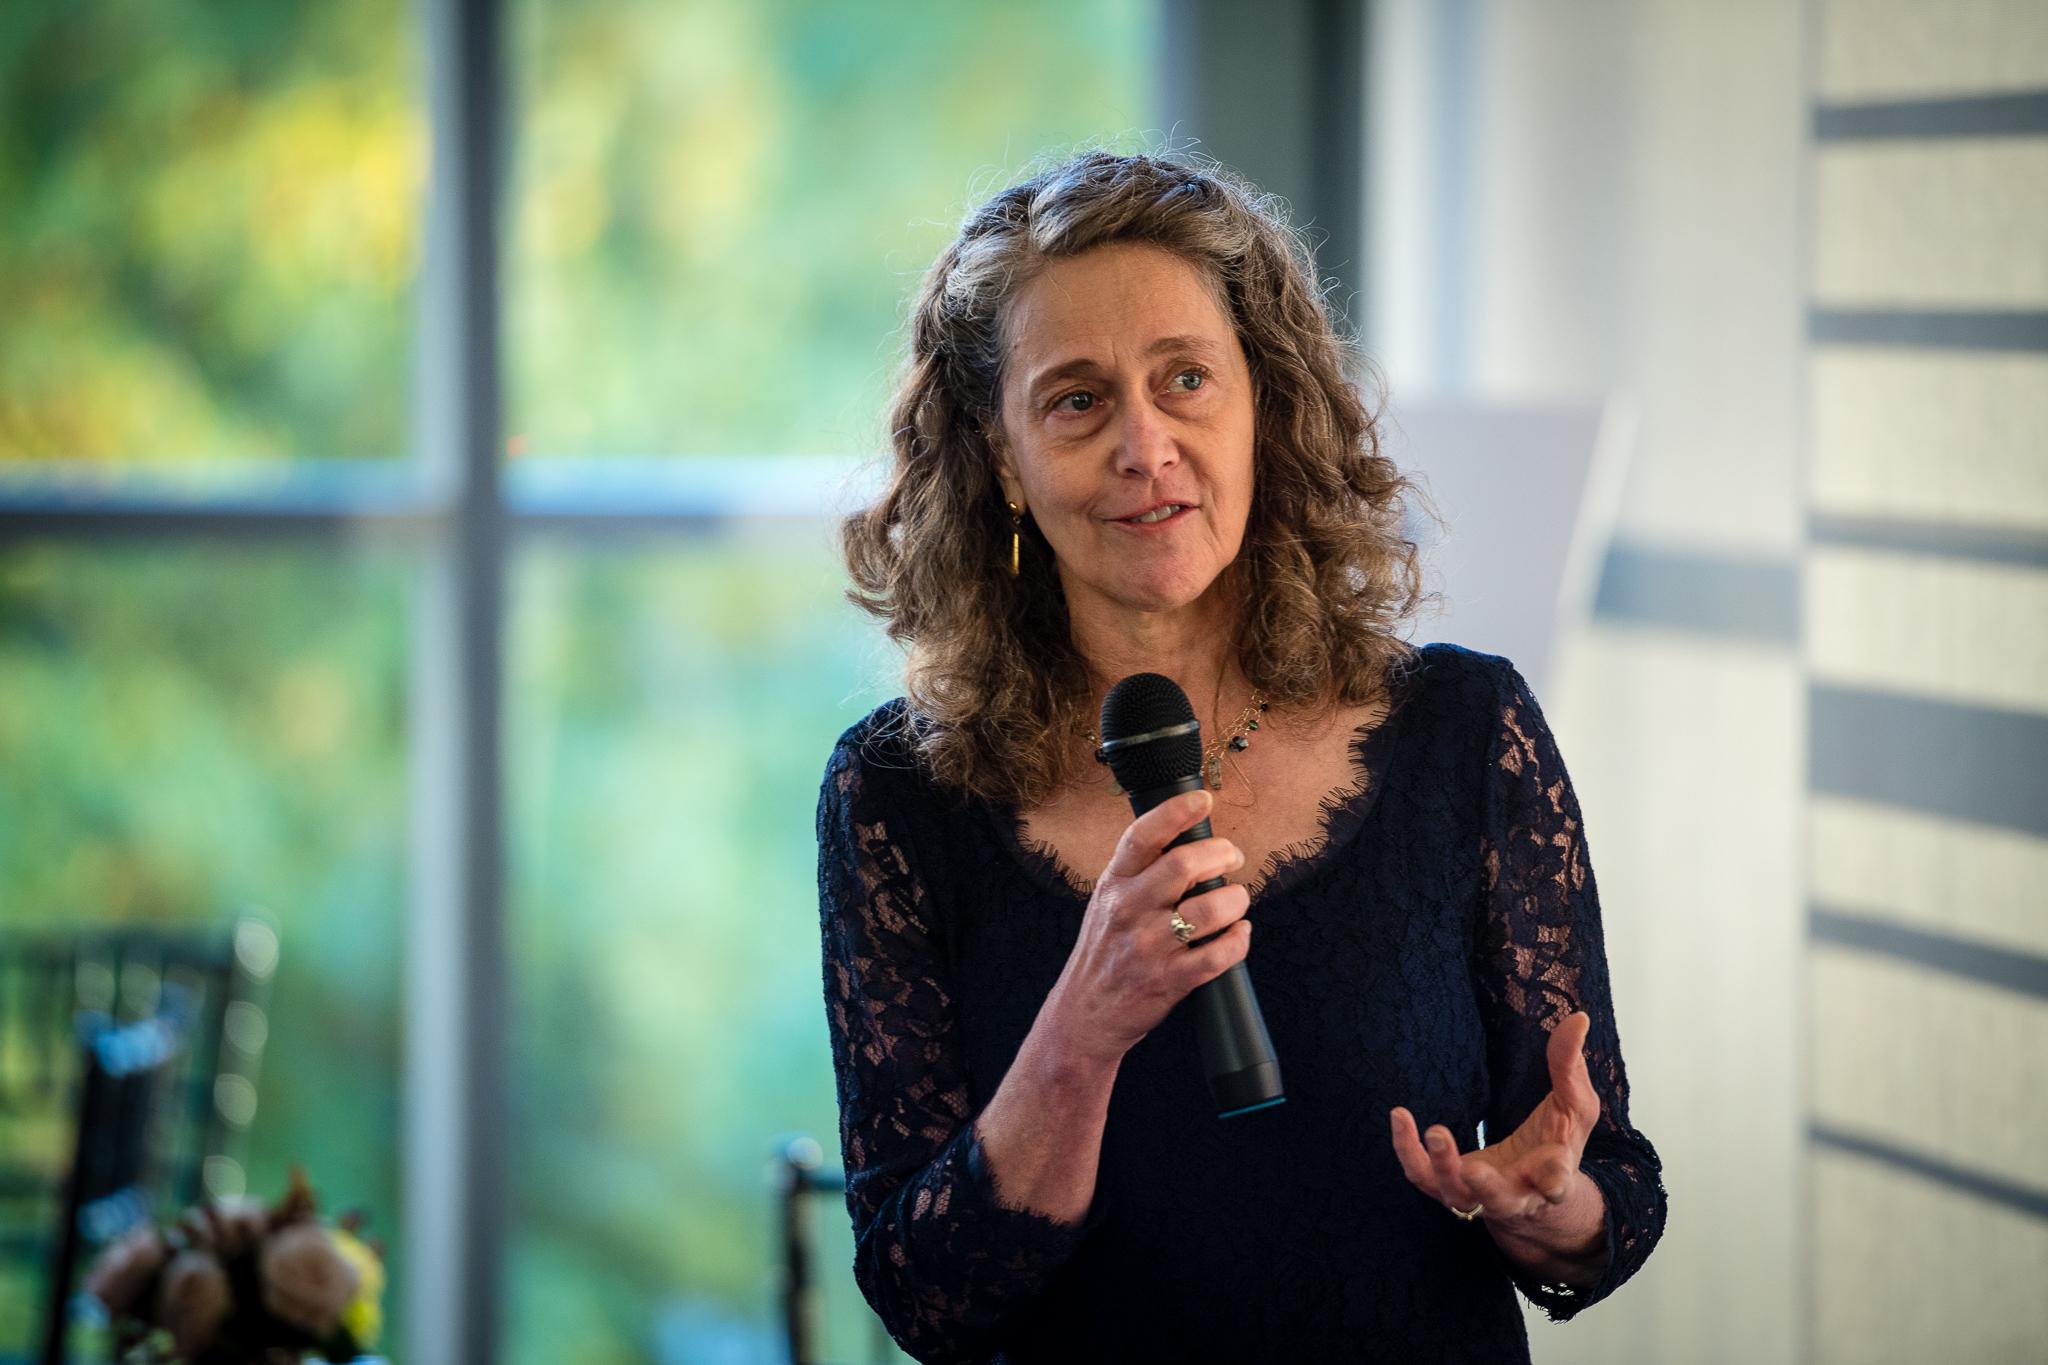 The Trust Project's Sally Lehrman